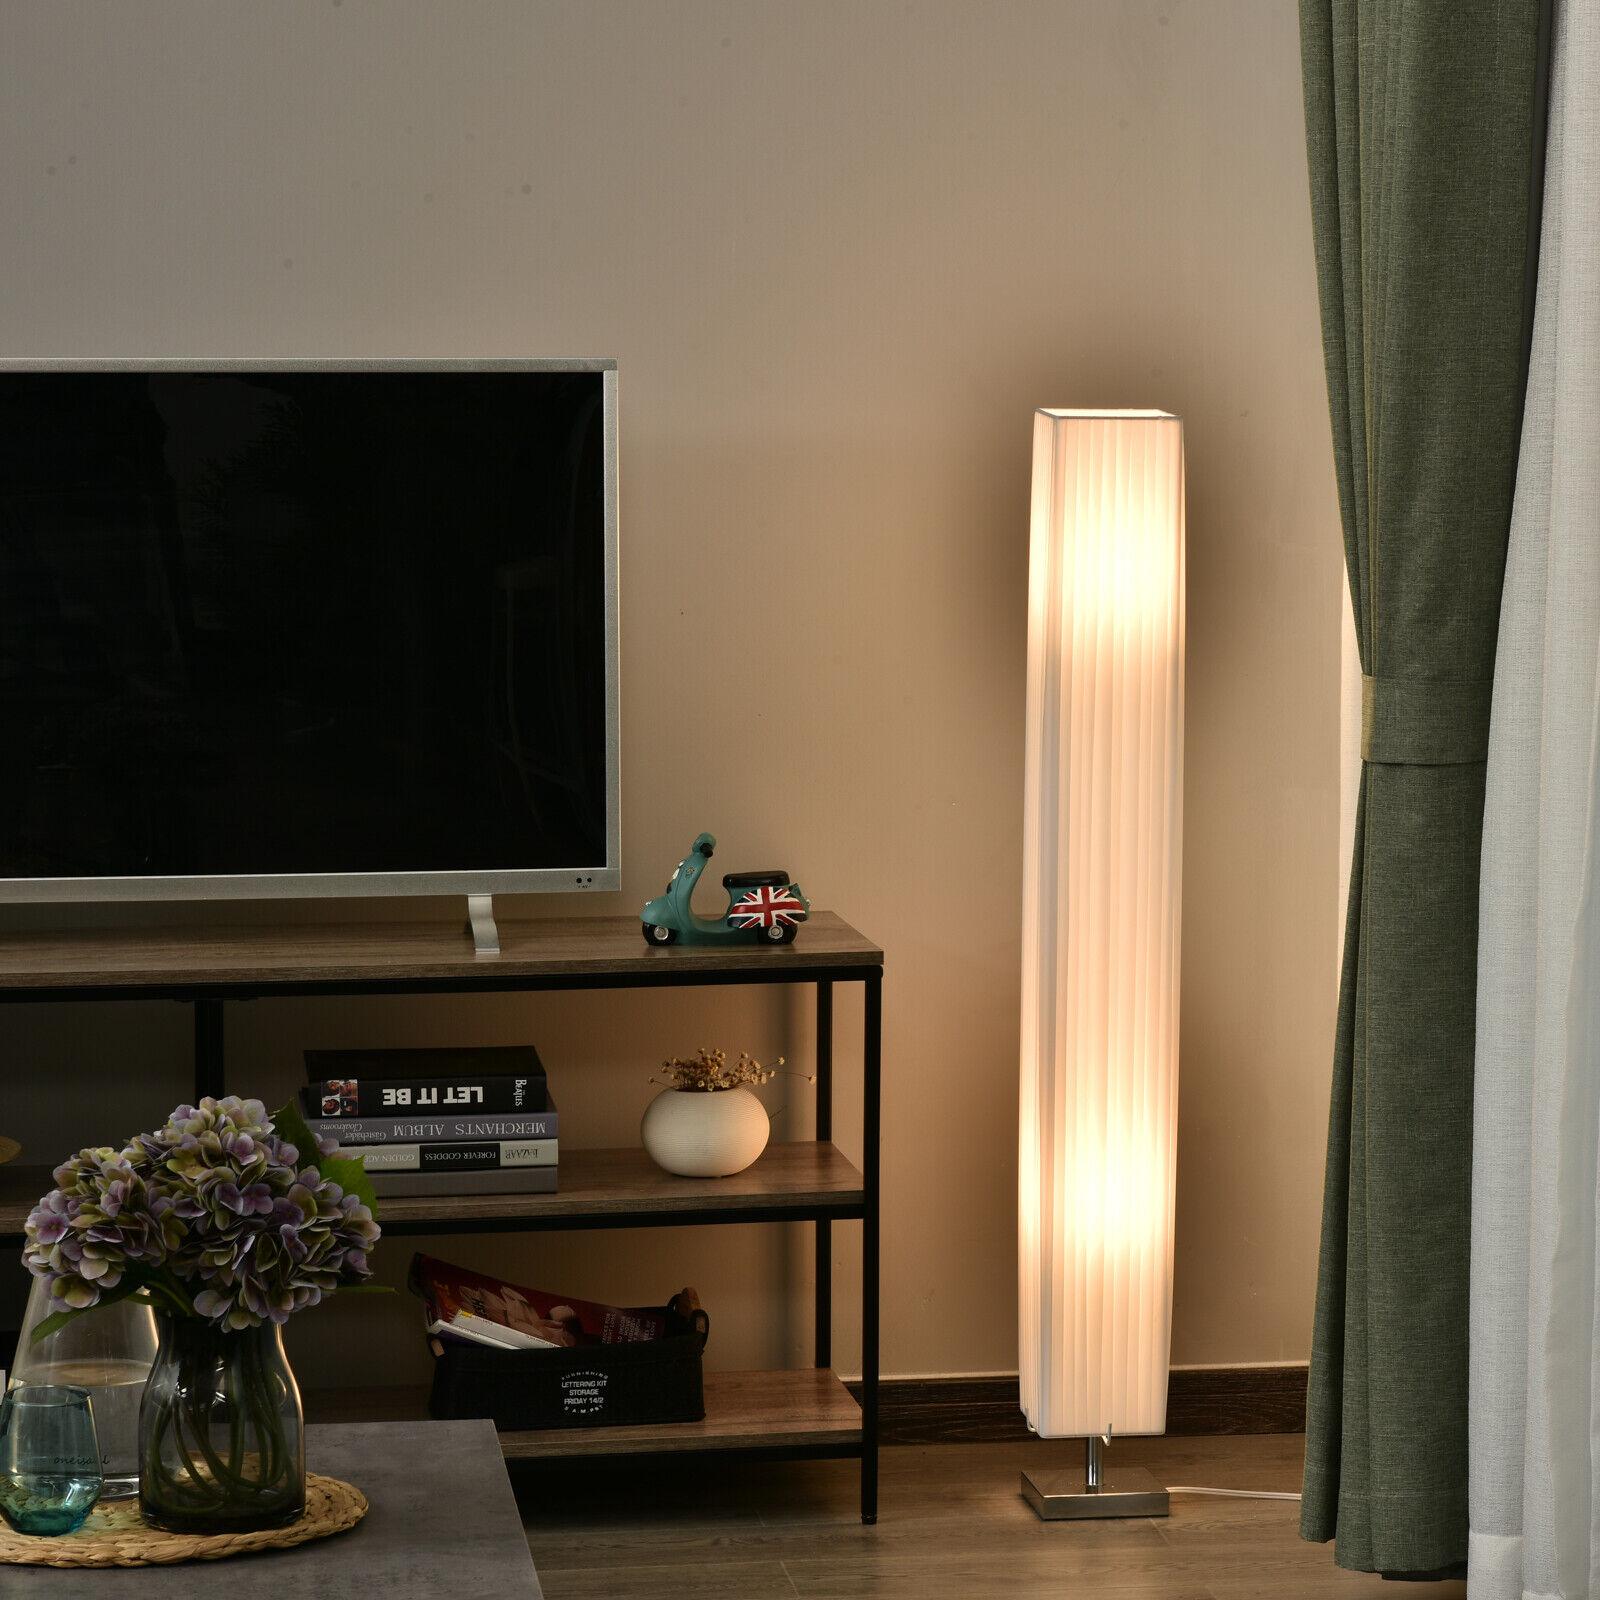 Picture of: Homcom 4 Tall Floor Lamp Modern Fabric Light Living Room W Stainless Steel Base For Sale Online Ebay